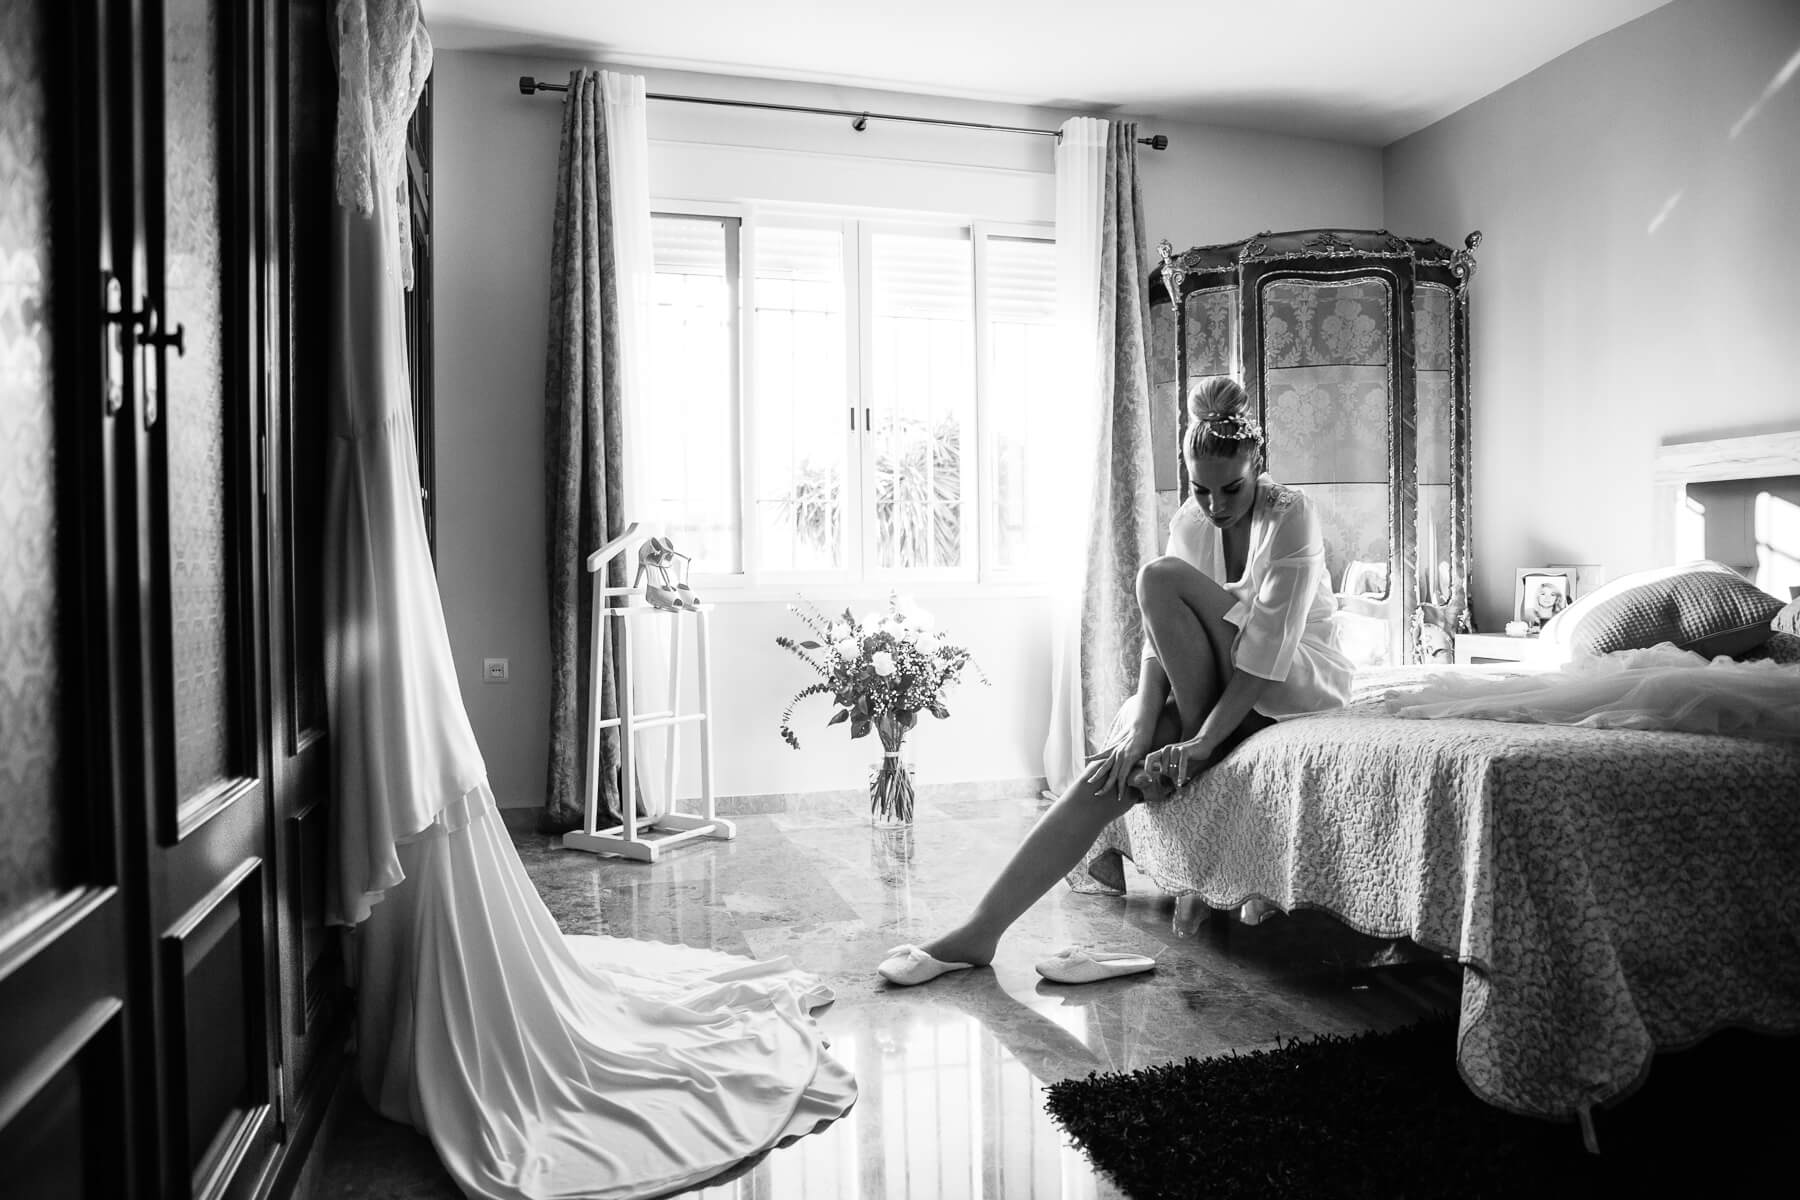 fotografo-bodas-cordoba-reportajes-de-boda-originales-diferentes-fotos-naturales-en-cordoba-Madrid-fotoperiodismo-de-boda-fotografia-artistica-Córdoba-Sevilla-Malaga-Jaén